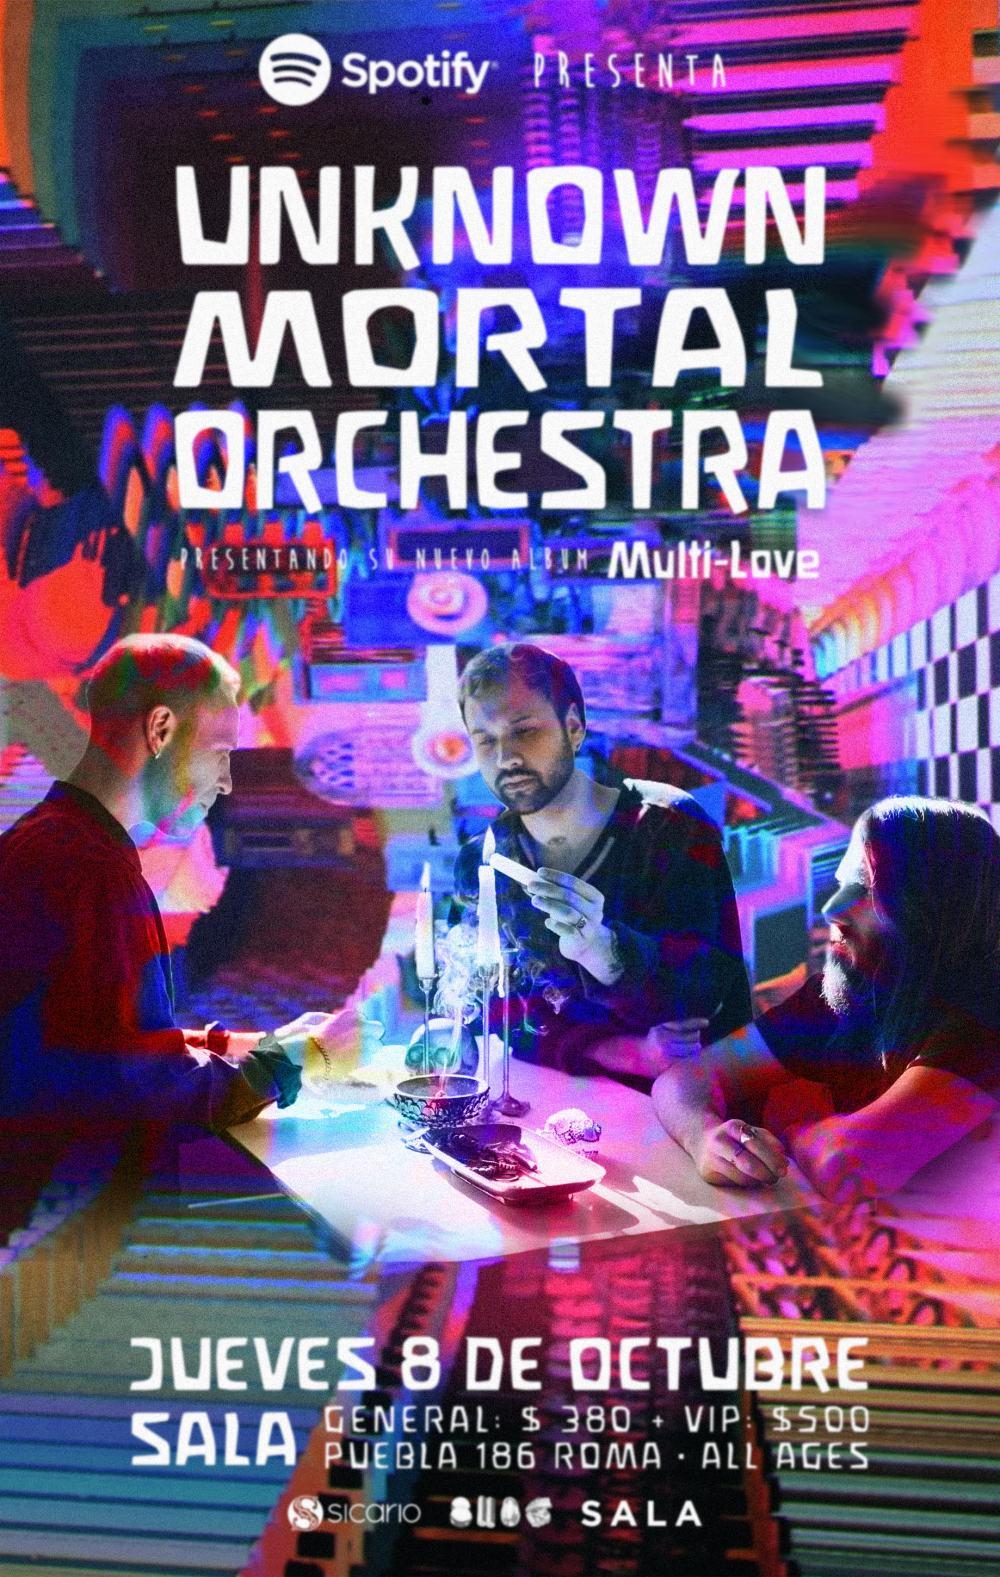 Mortal orchestra